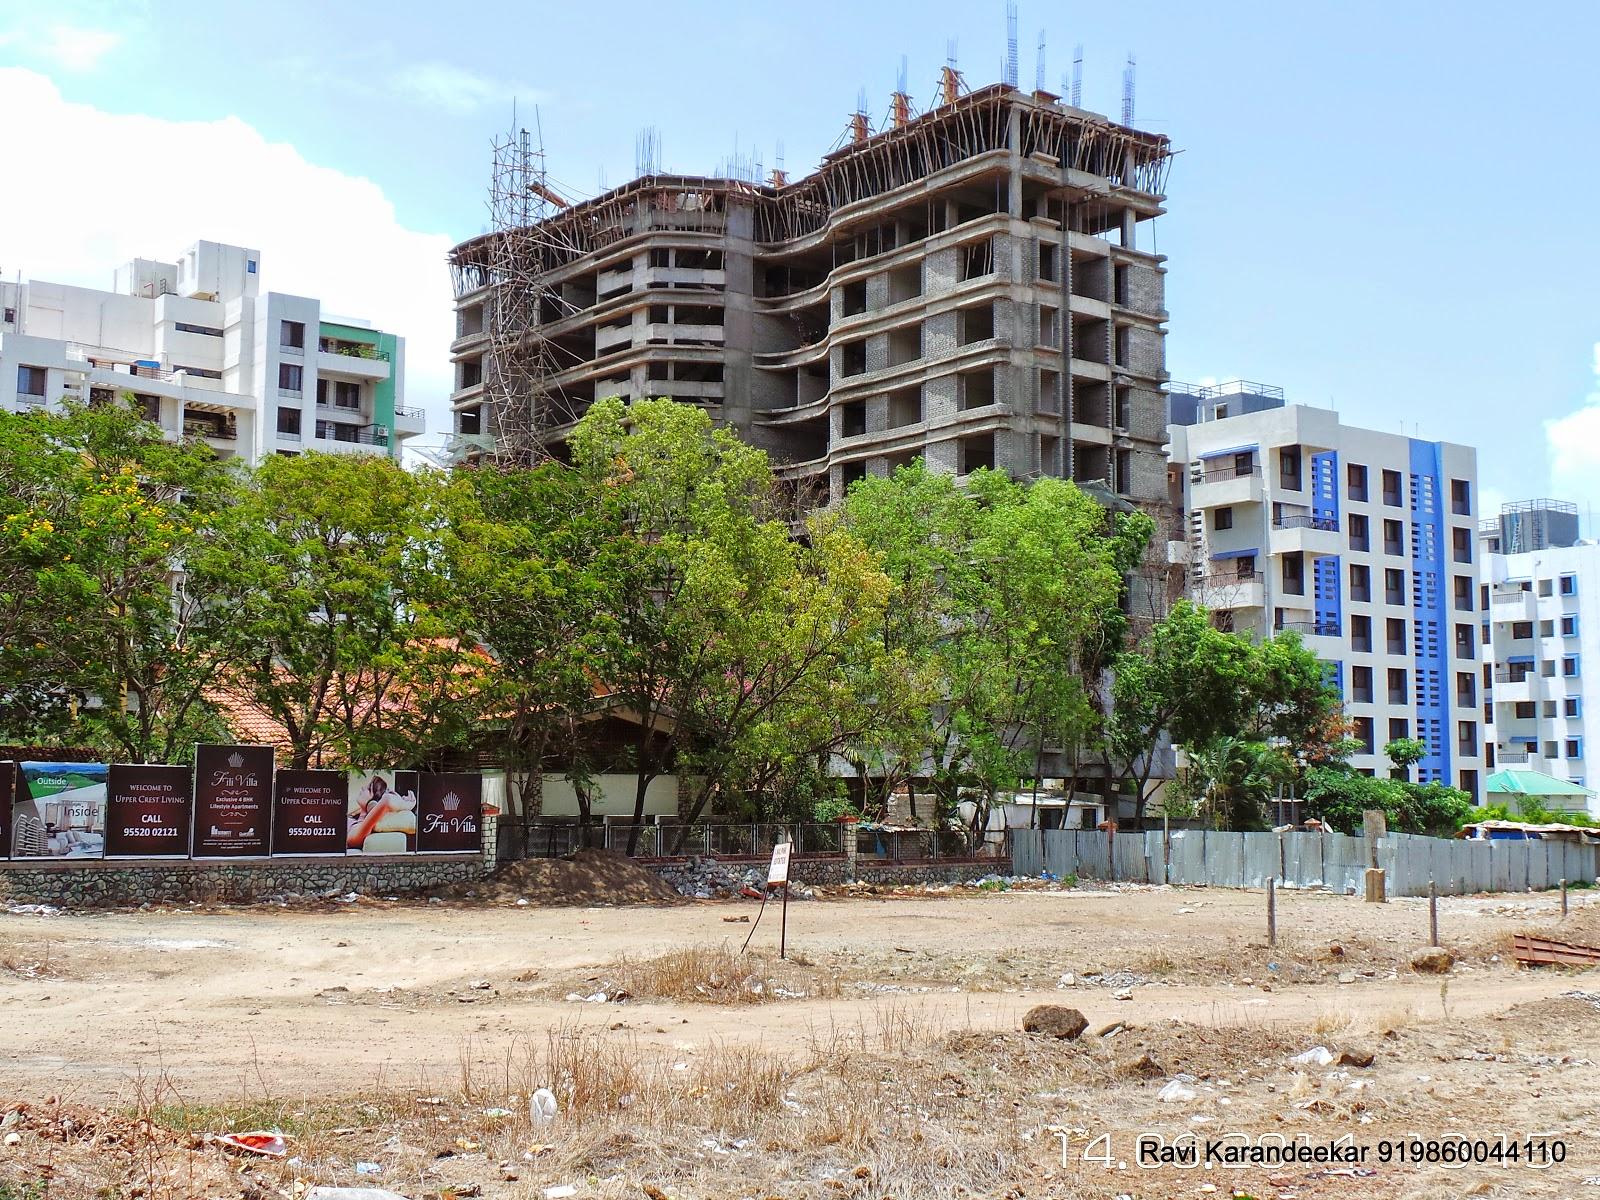 Ravi Karandeekar's Pune Real Estate Market News Blog: A 2